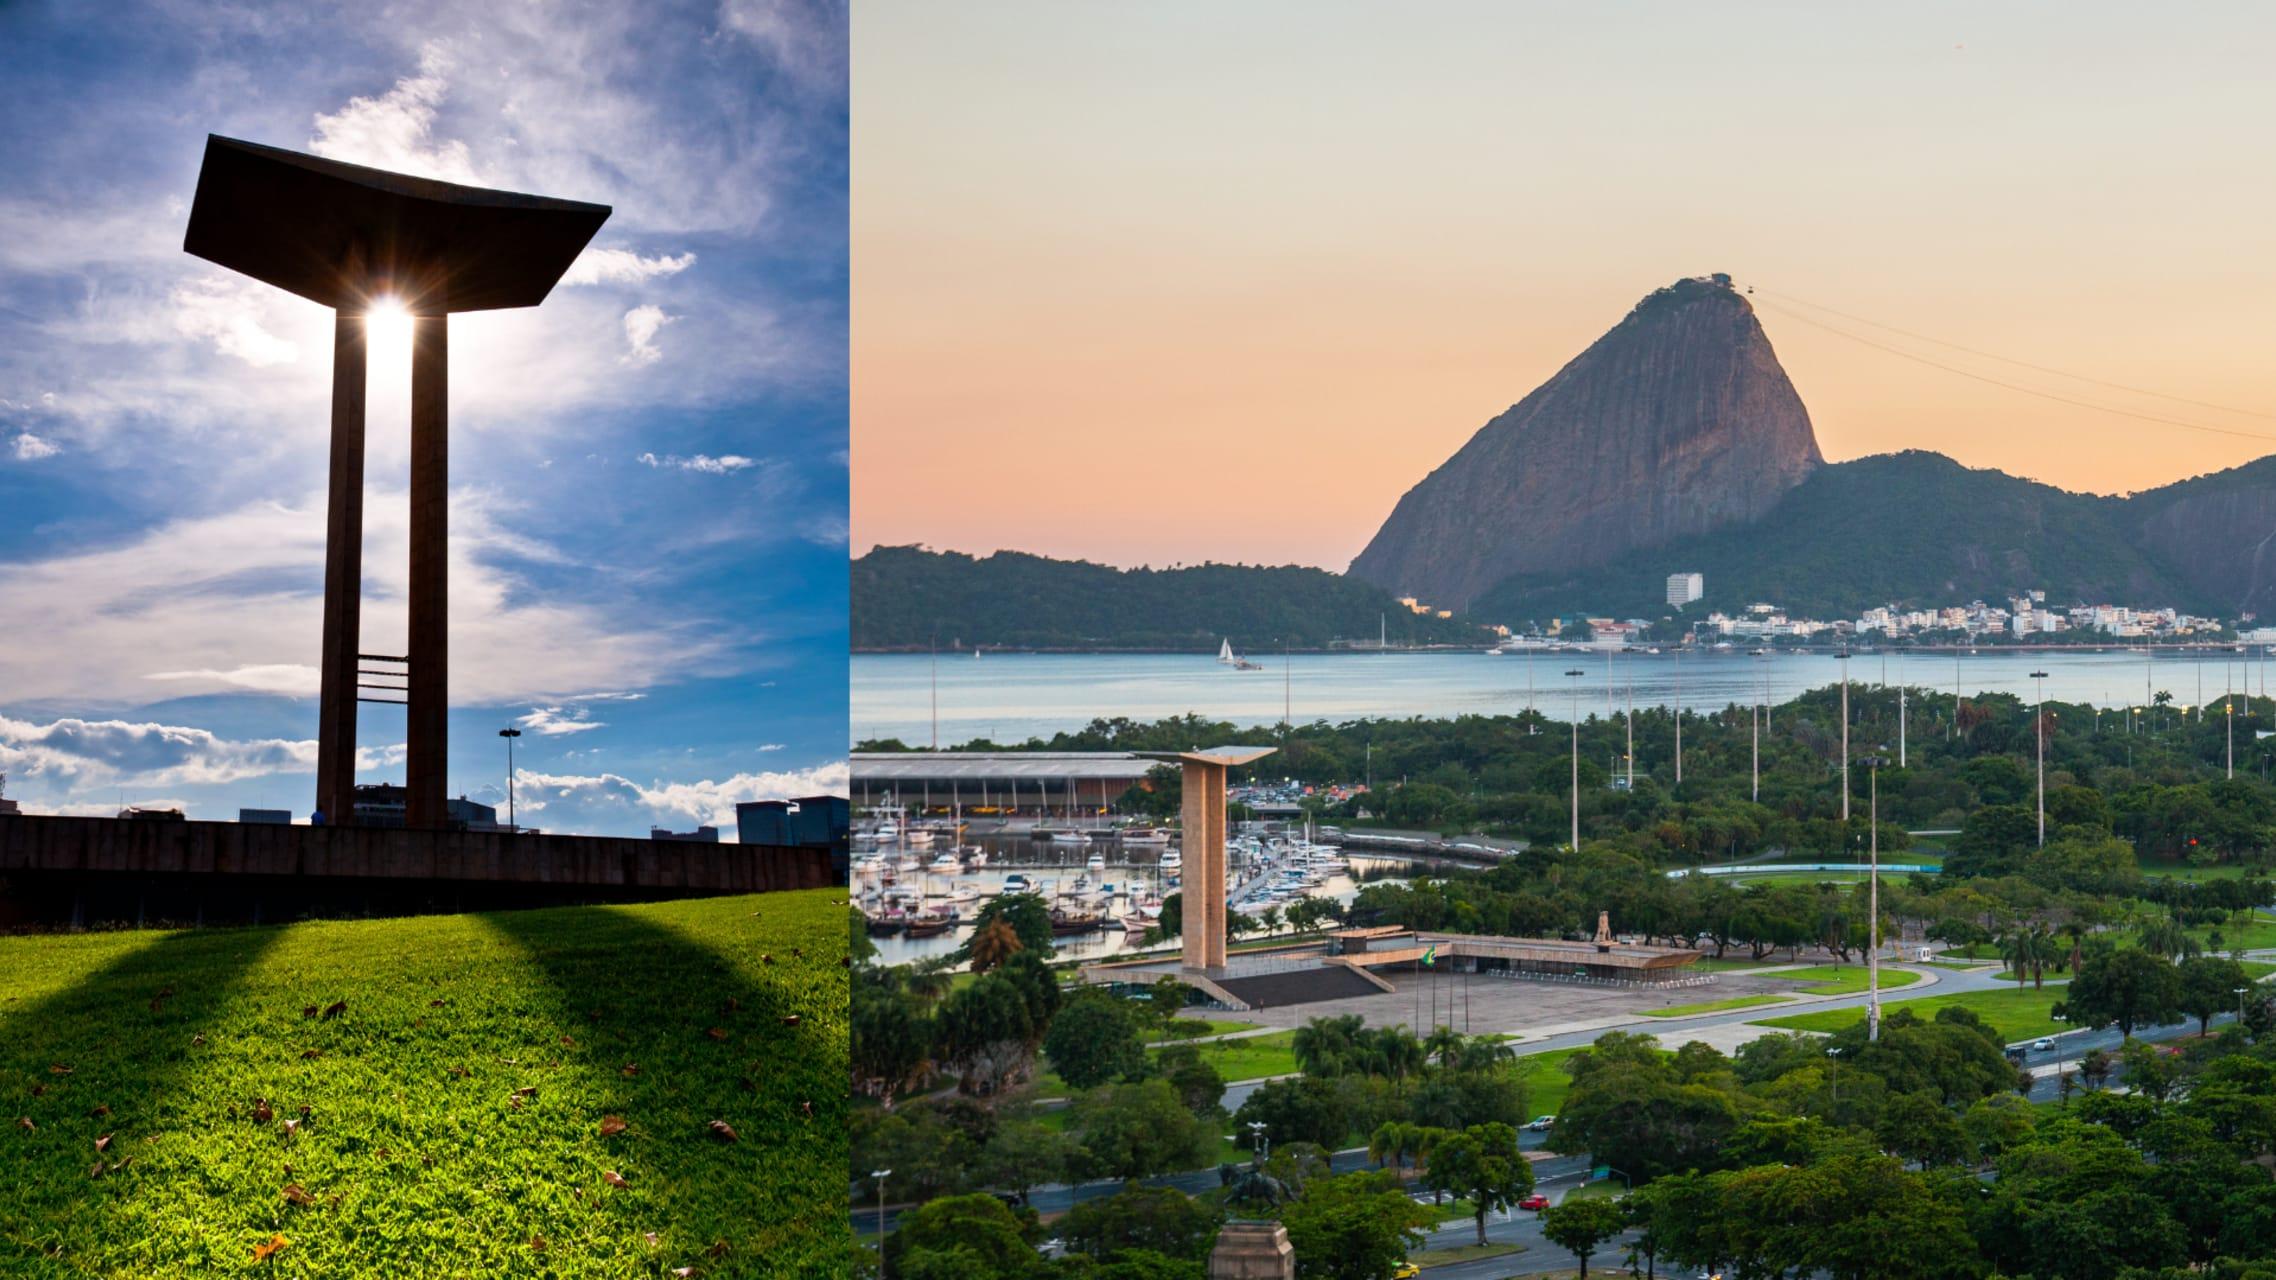 Rio de Janeiro - RIO National Monument to the Dead of WWII